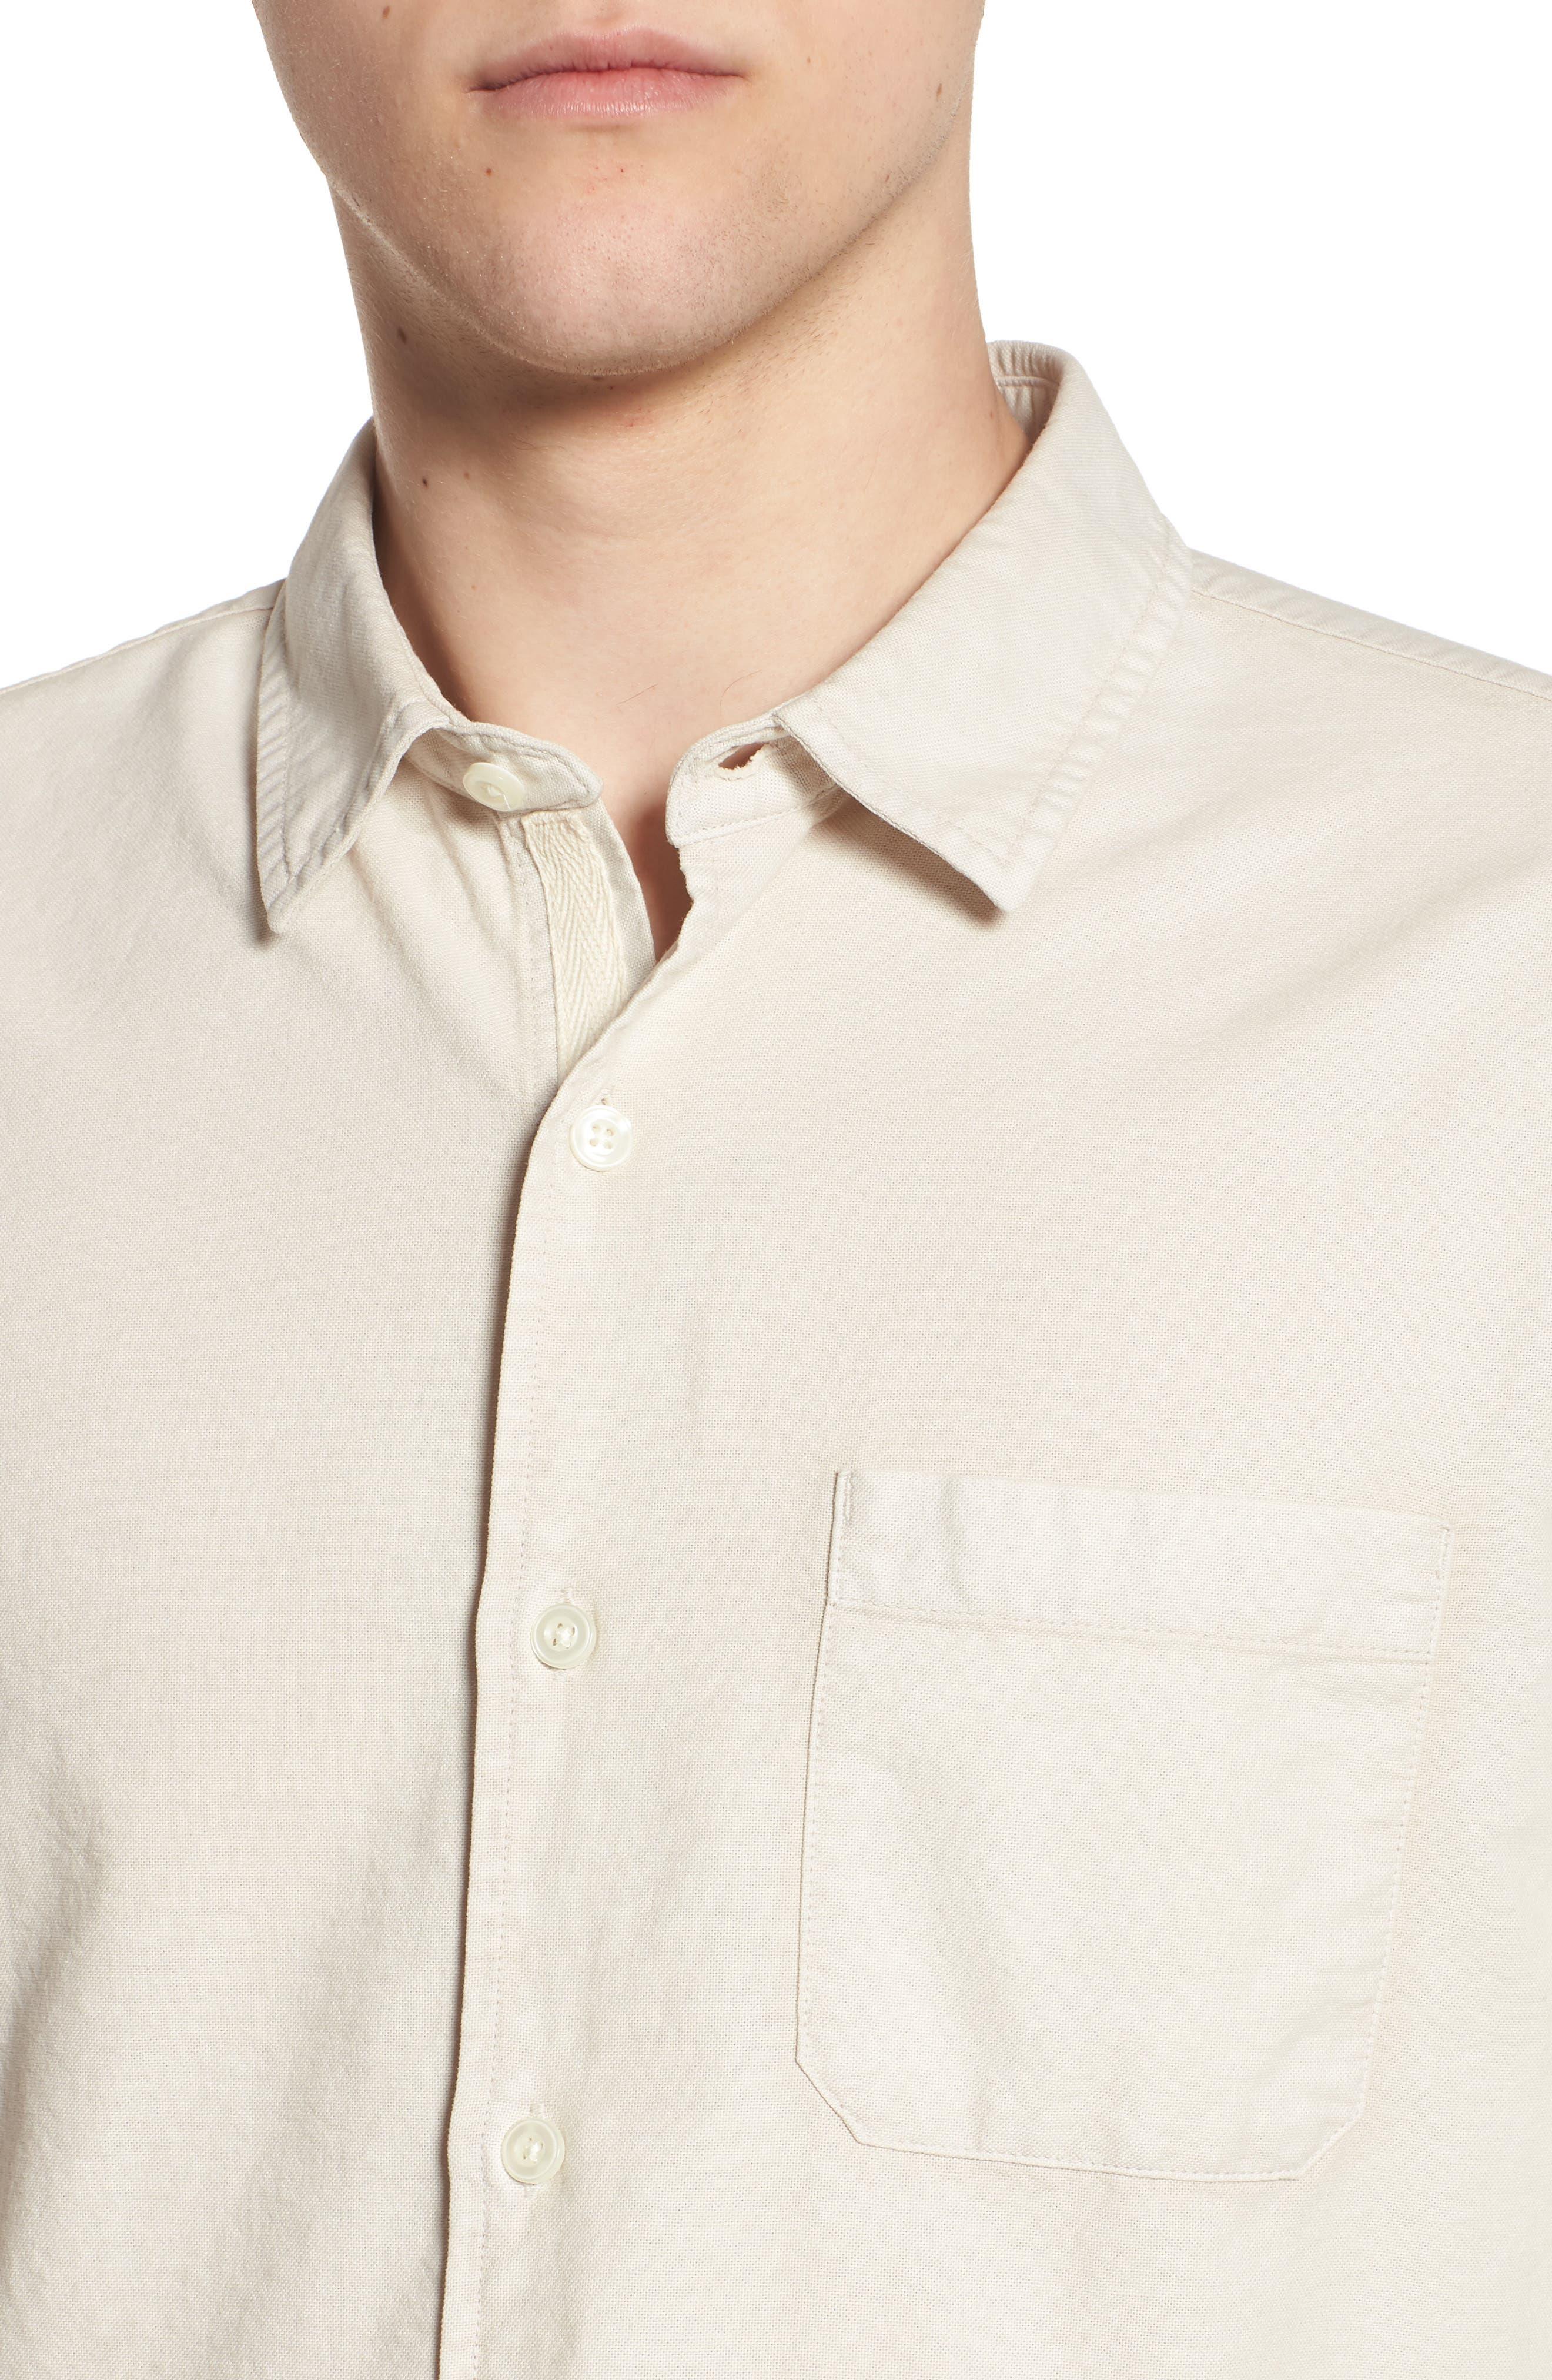 Bristol Slim Fit Sport Shirt,                             Alternate thumbnail 4, color,                             Sunbaked Mineral Veil